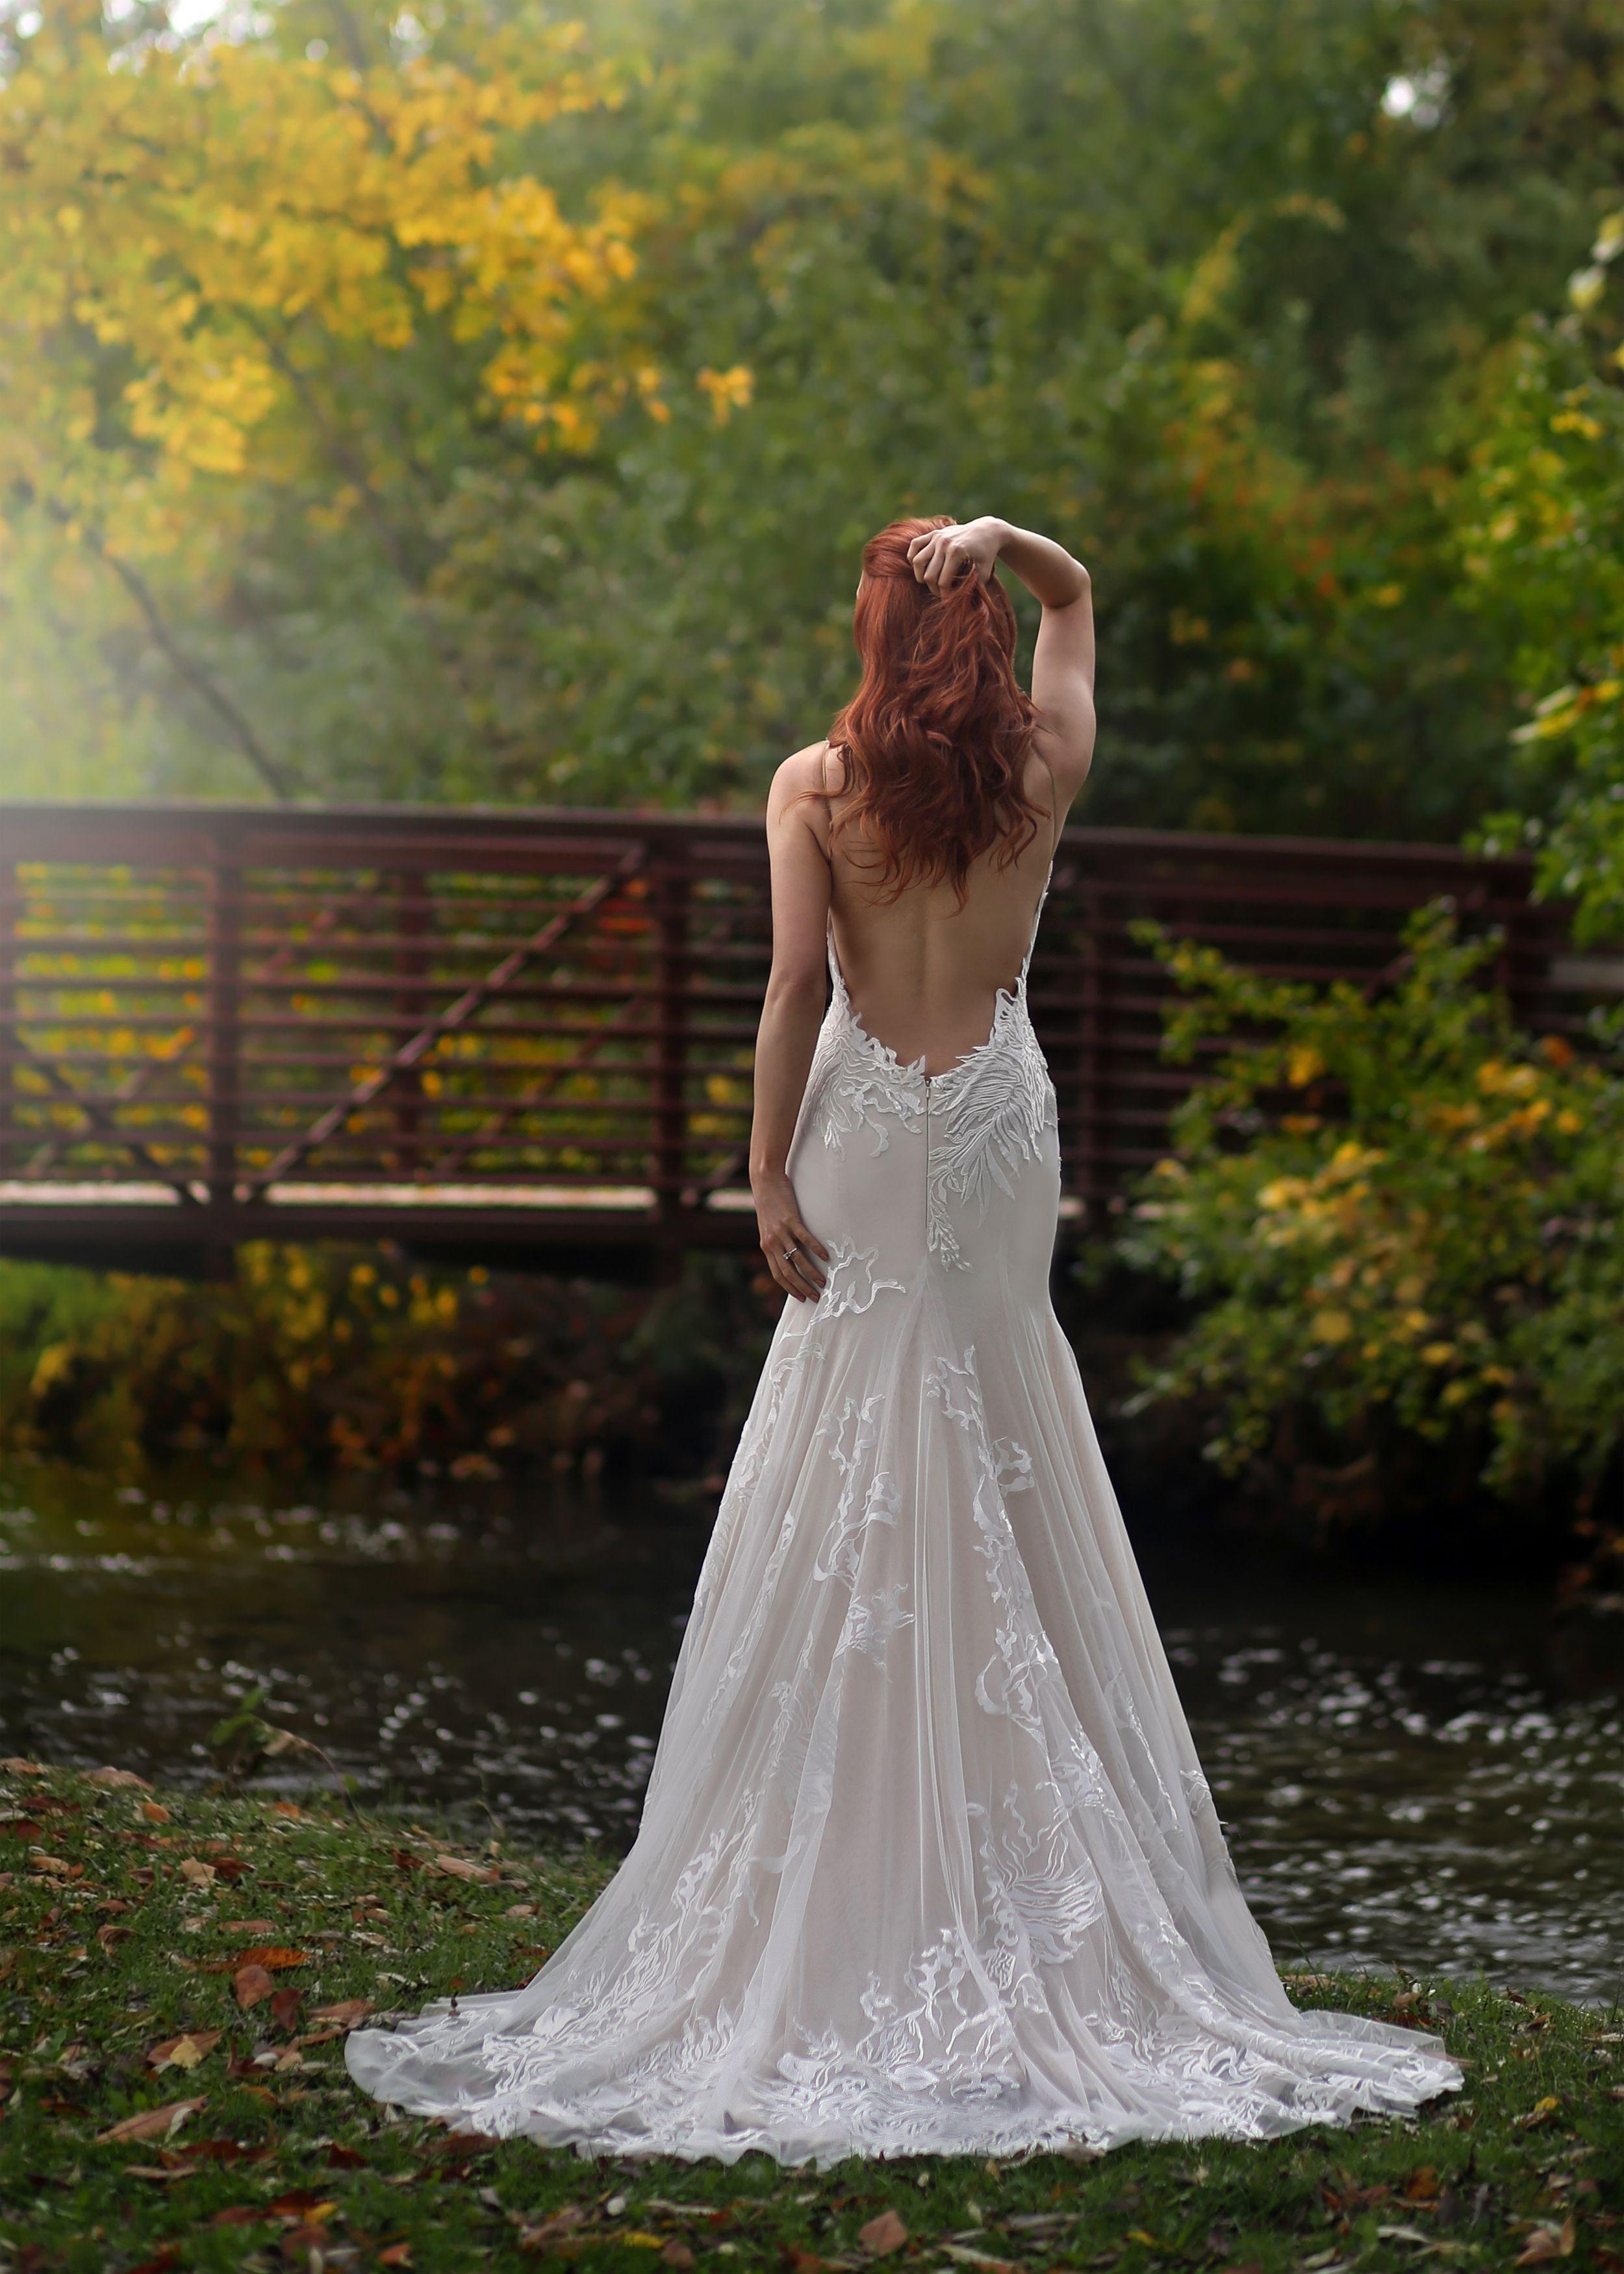 Marisa bridals low back lace wedding dress from solutions bridal marisa bridals low back lace wedding dress from solutions bridal in orlando florida ombrellifo Choice Image